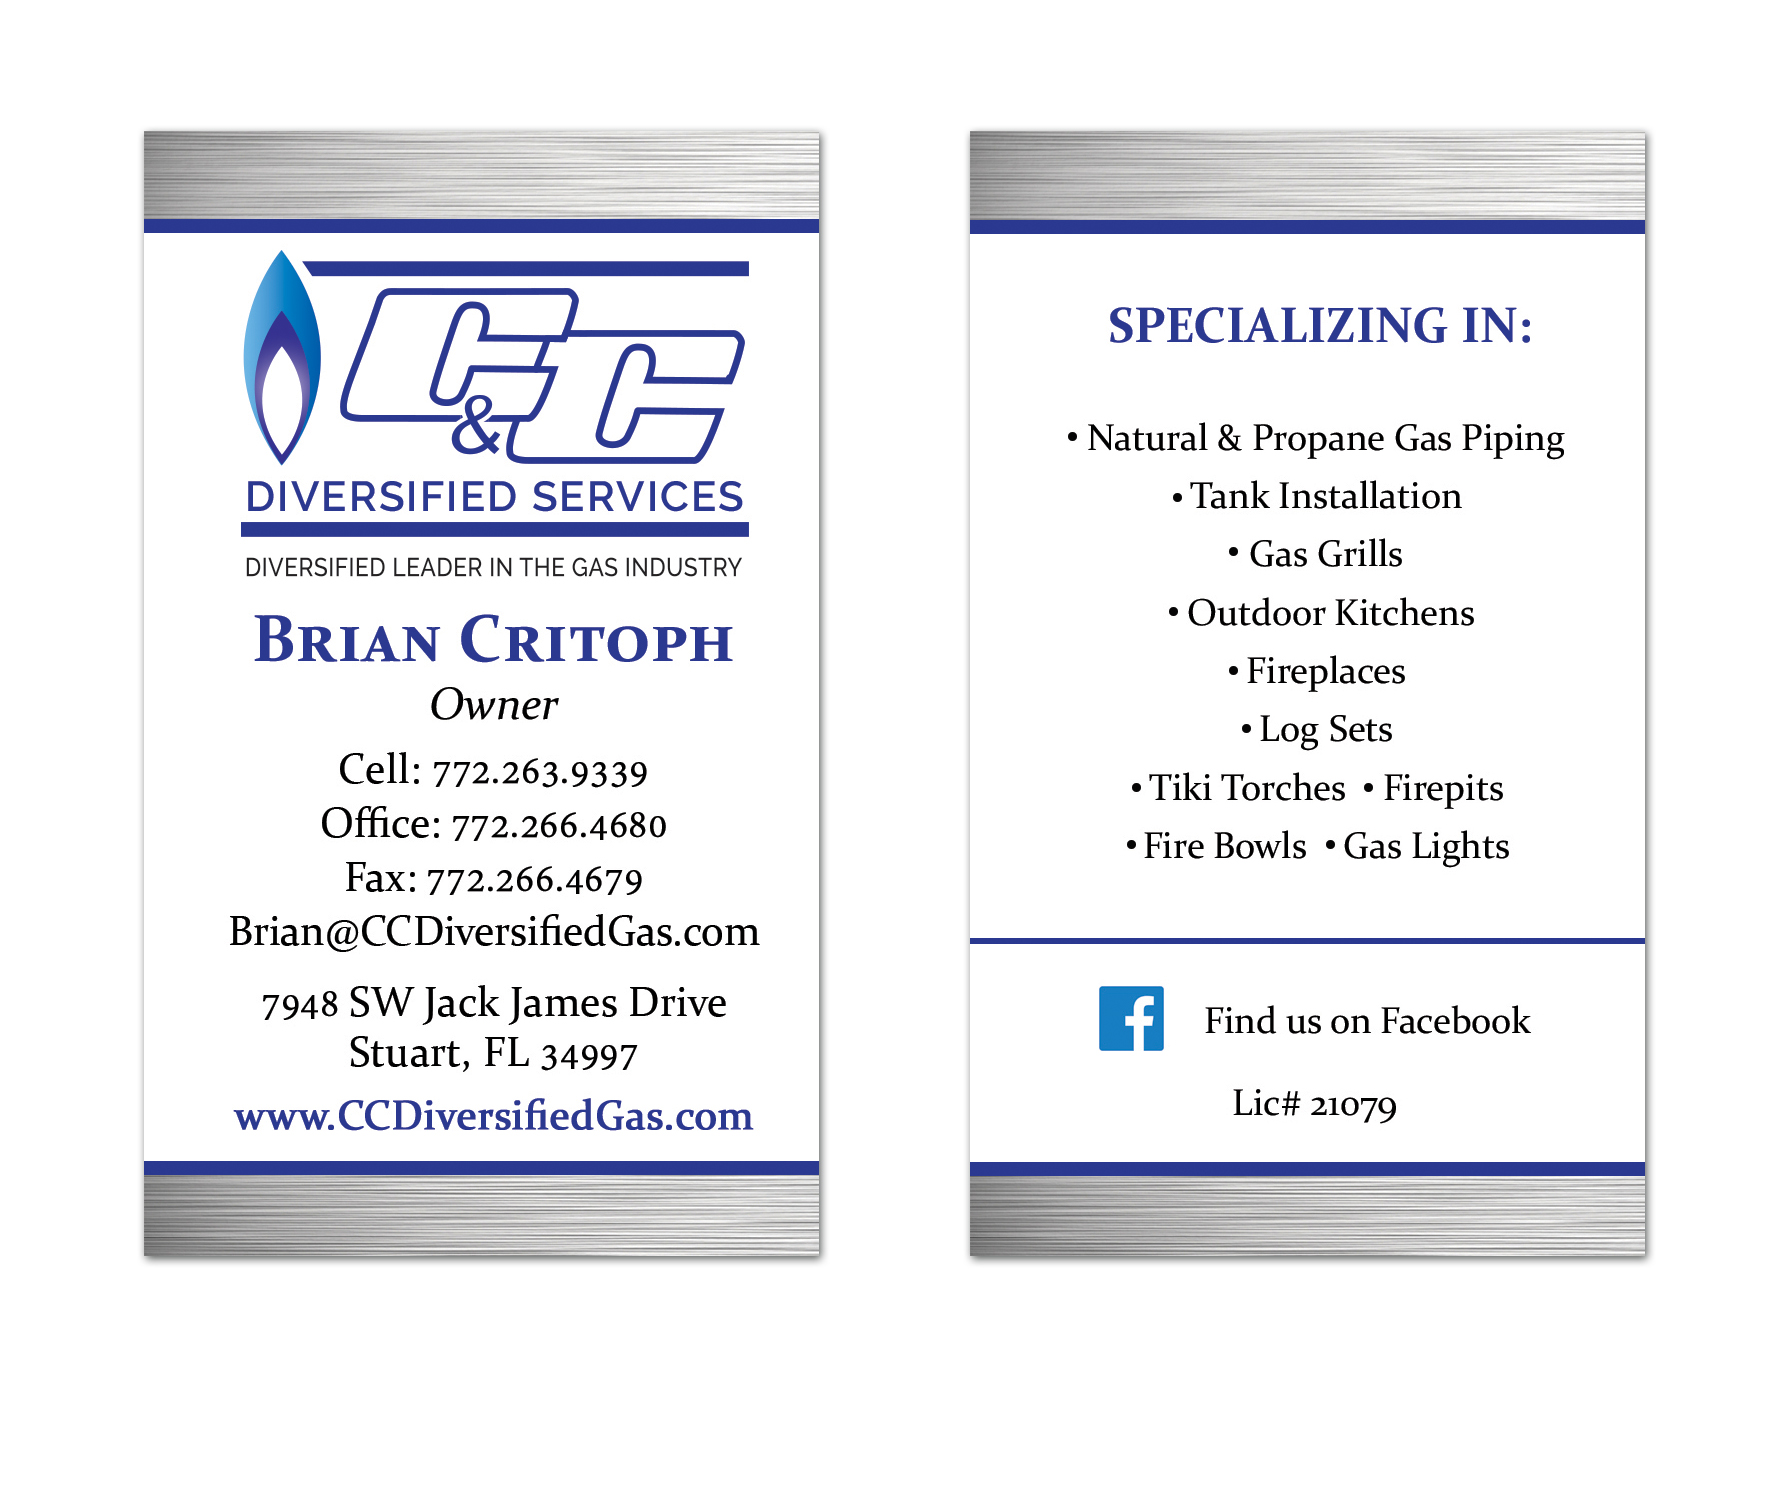 C & C Diversified Services Business Card Design